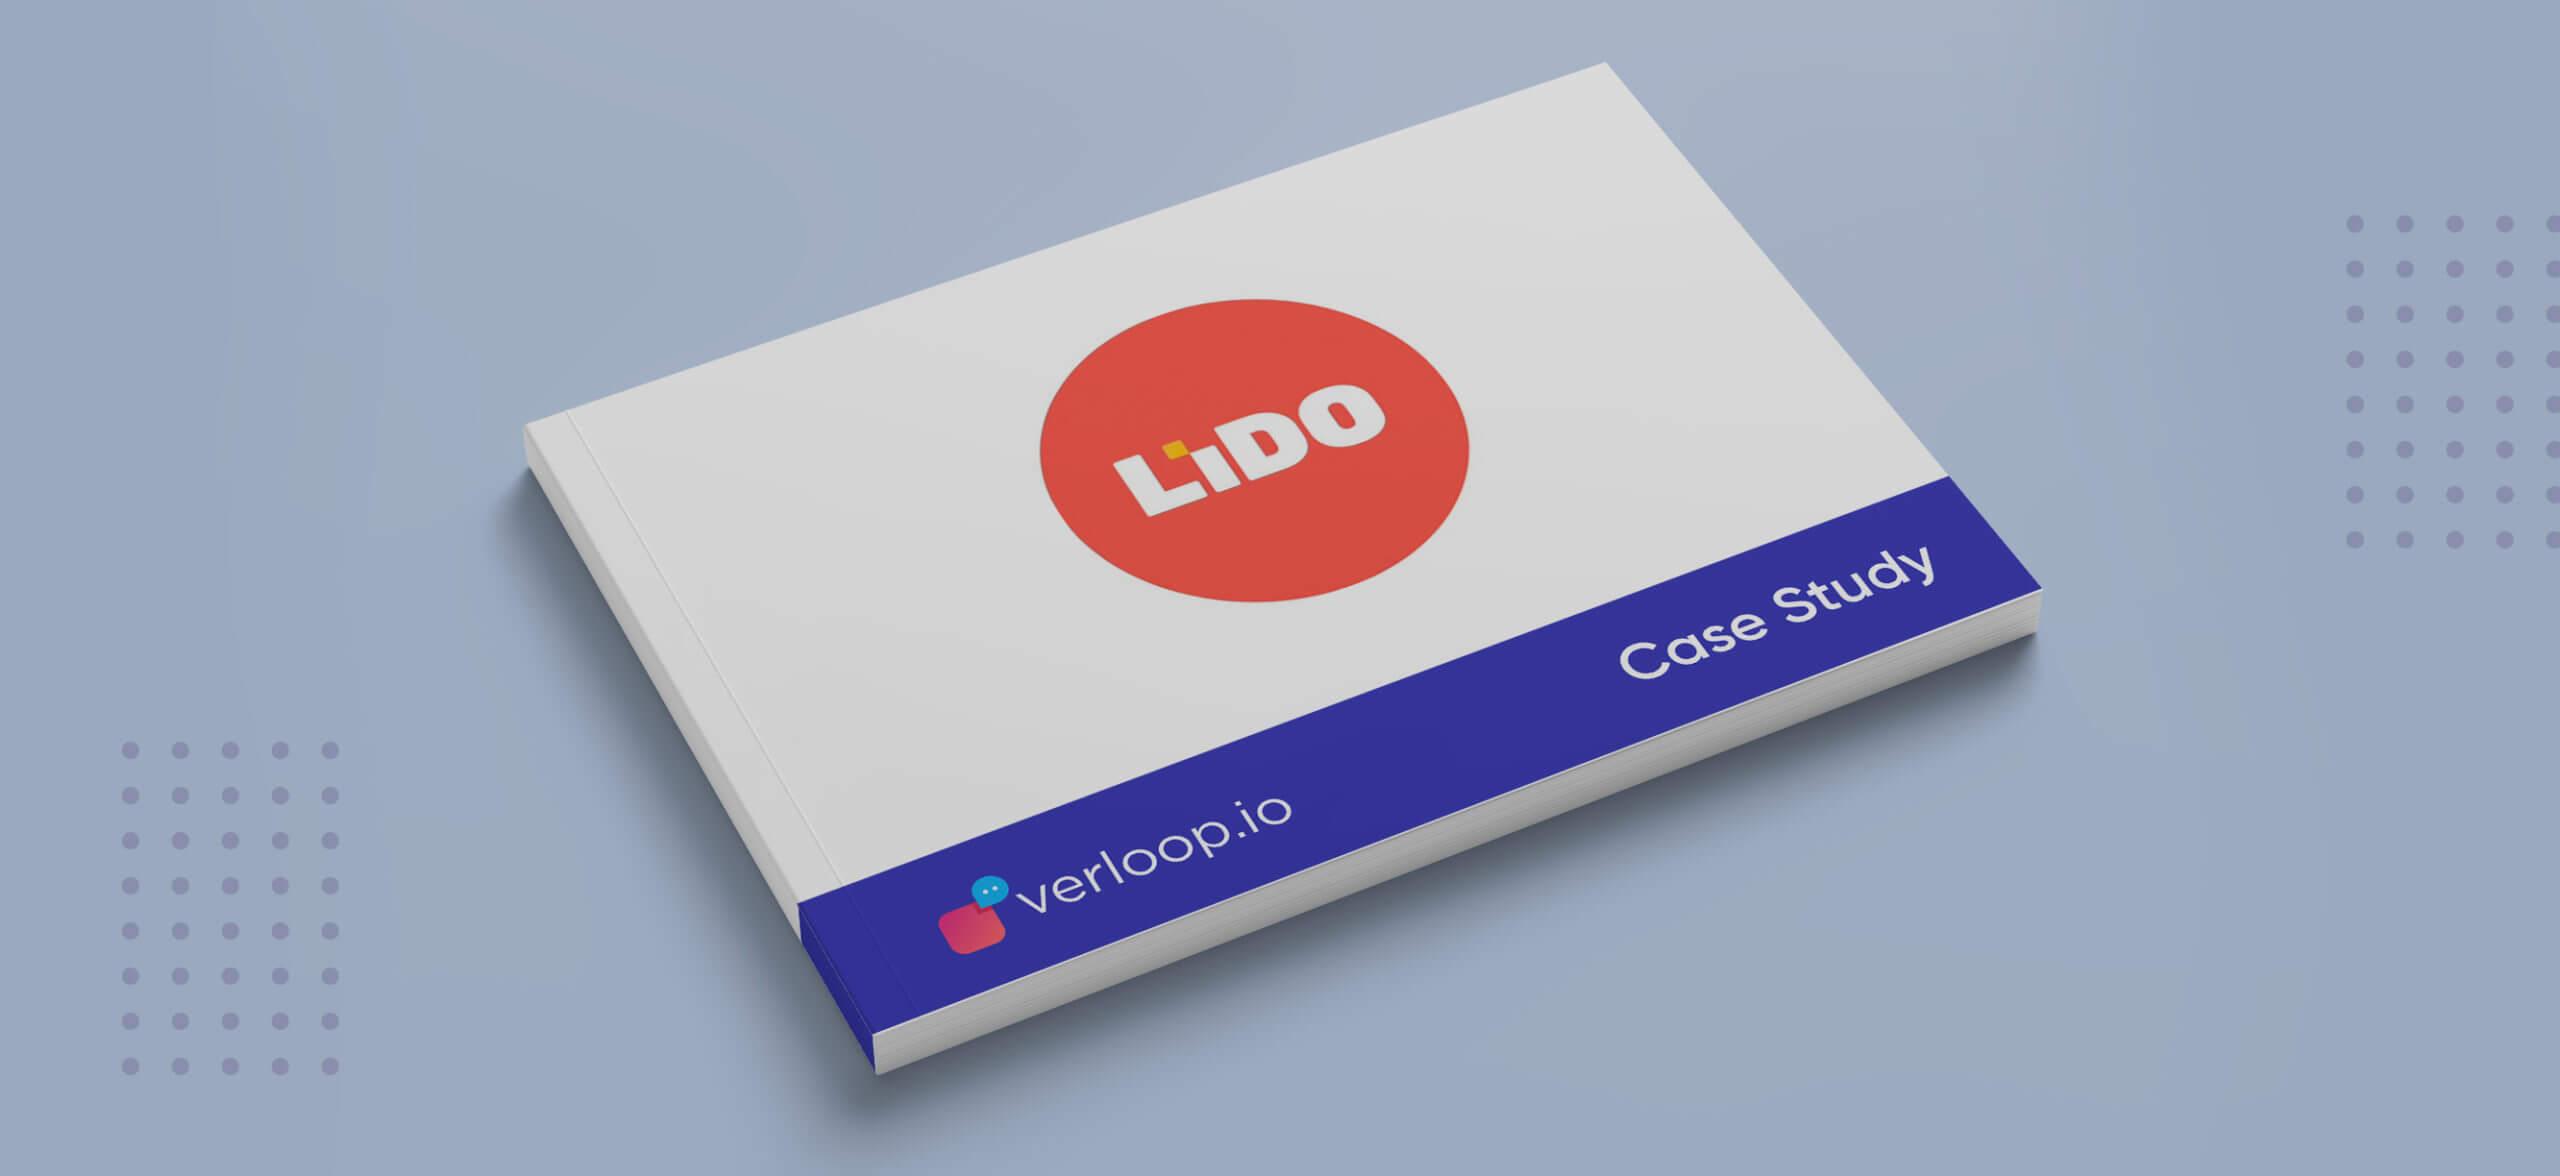 Lido-Learning